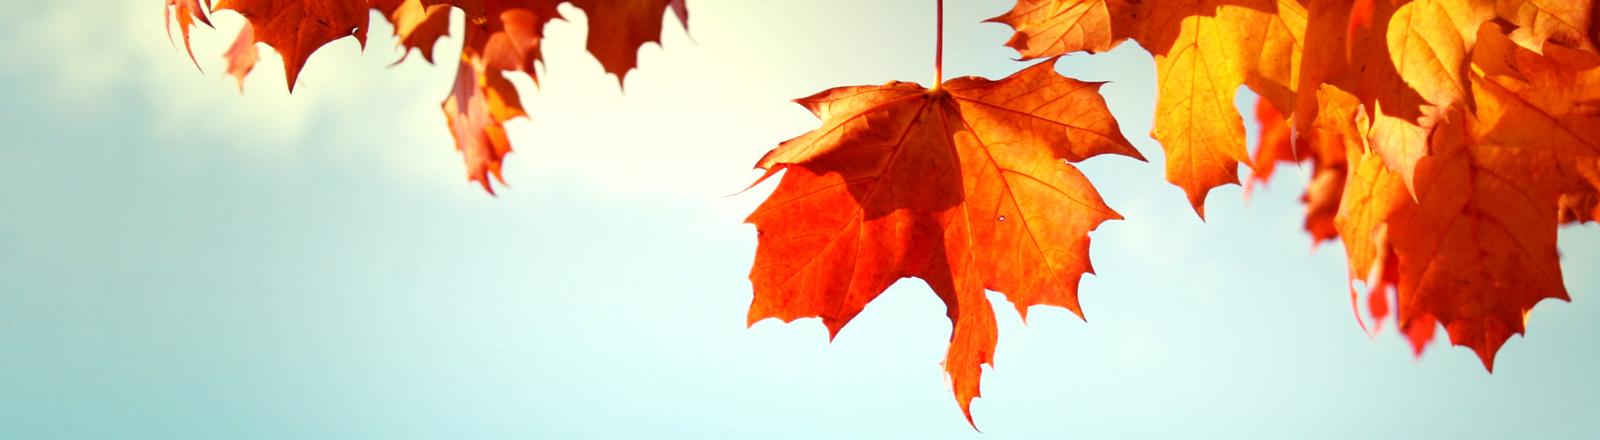 Buntes Herbstlaub vor blauem Himmel